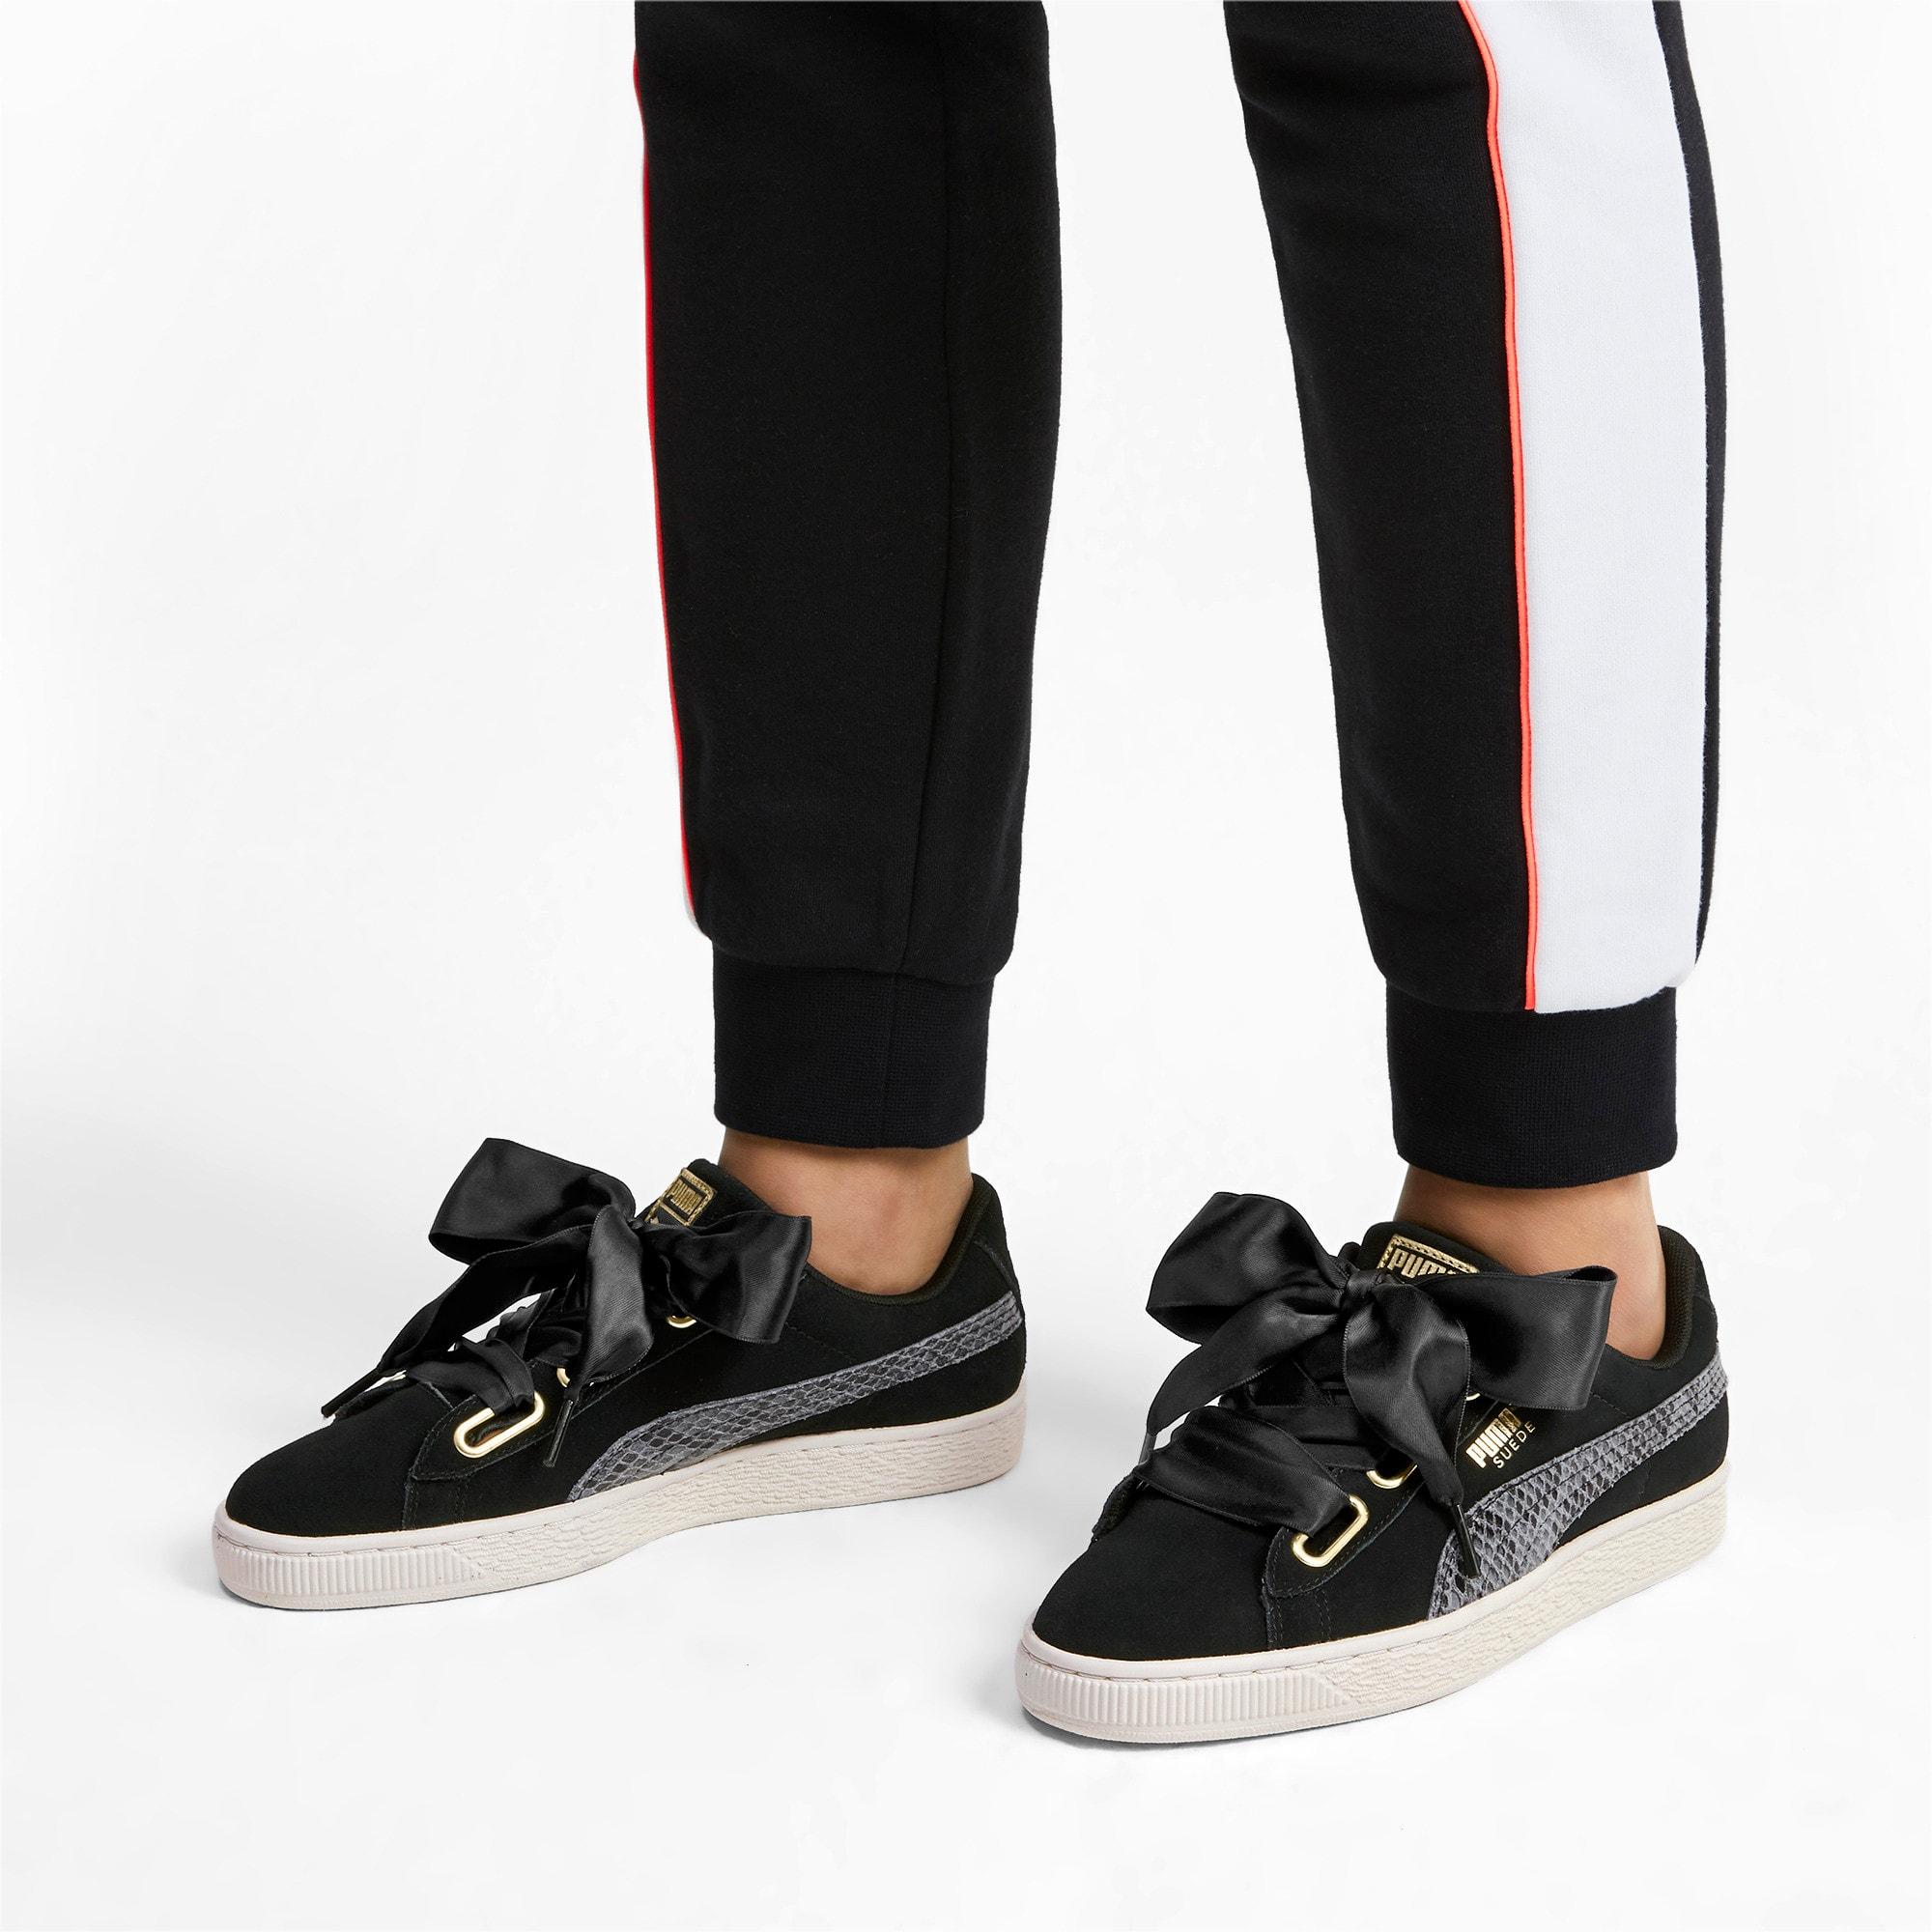 Thumbnail 2 of Suede Heart Snake Lux Women's Sneakers, Puma Black-Puma Team Gold, medium